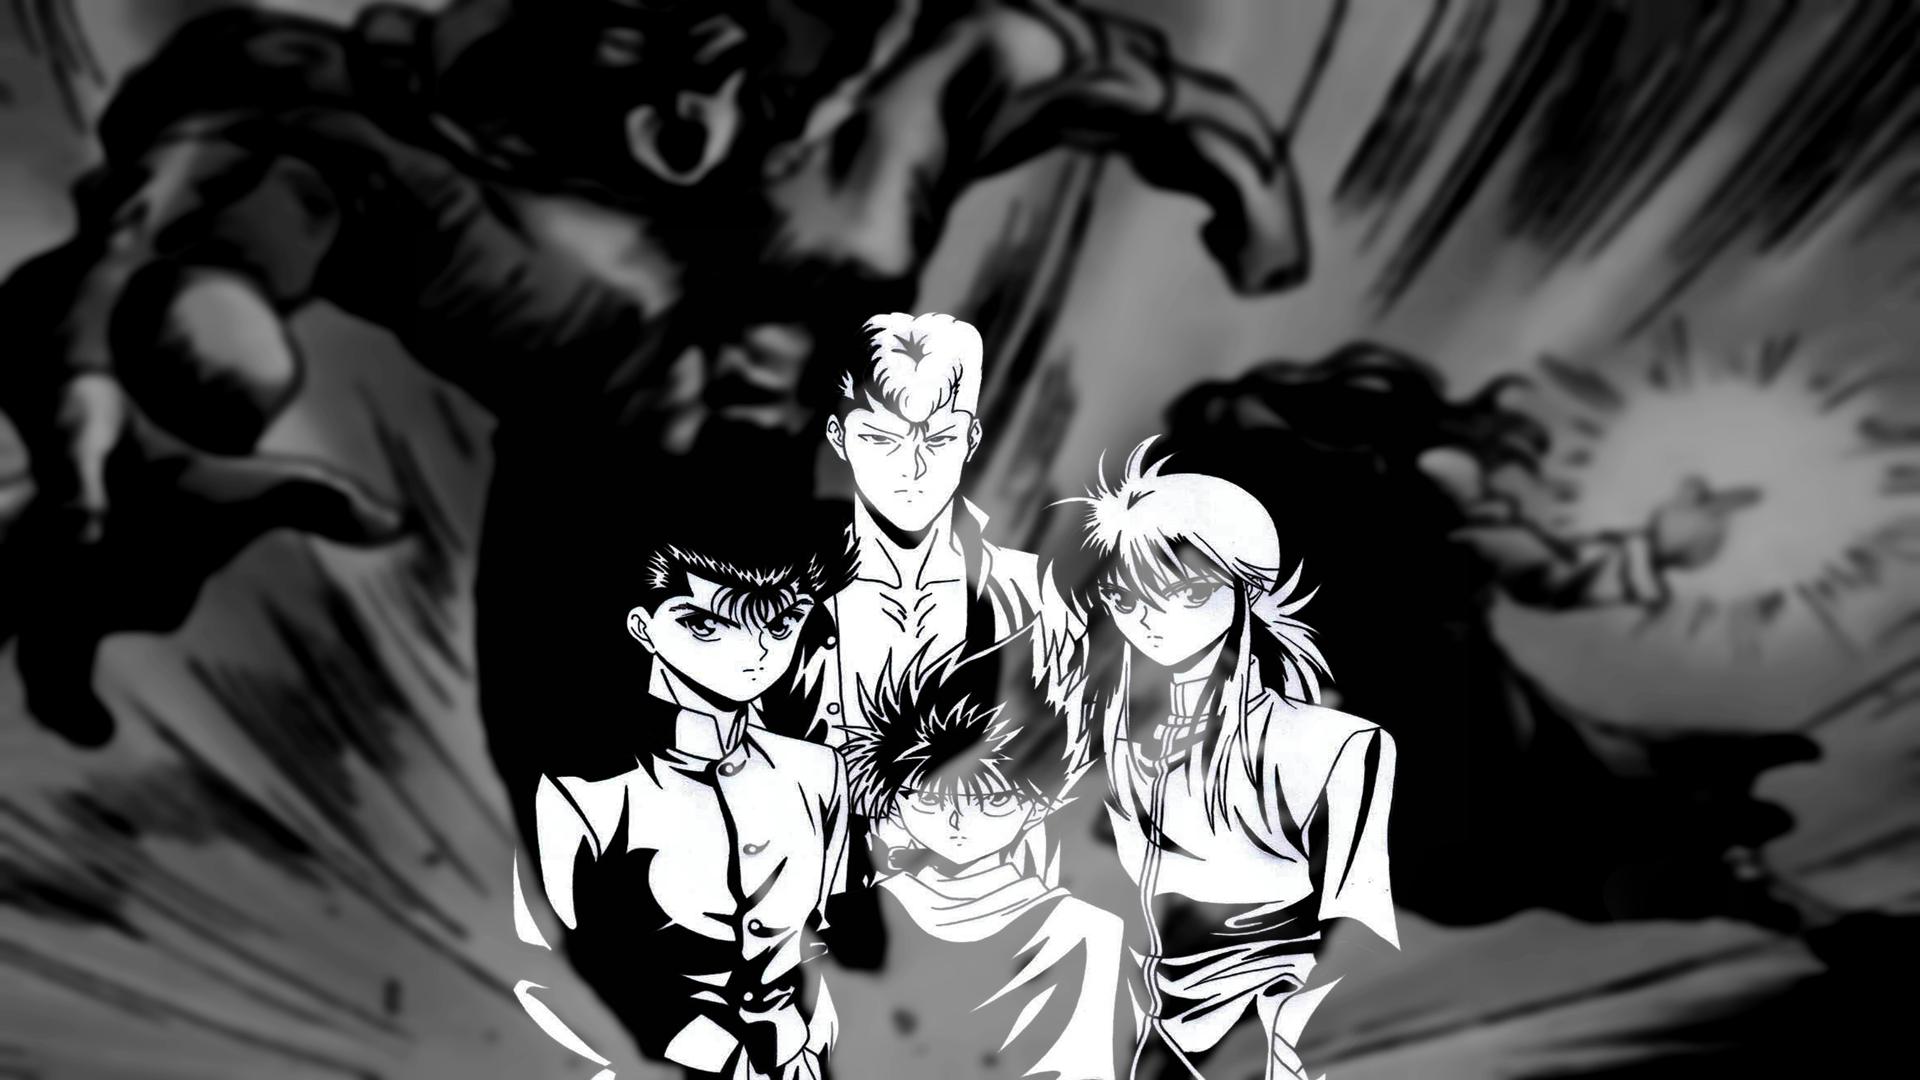 Yu Yu Hakusho Dark Tournament Saga By Theamvdbz On Deviantart